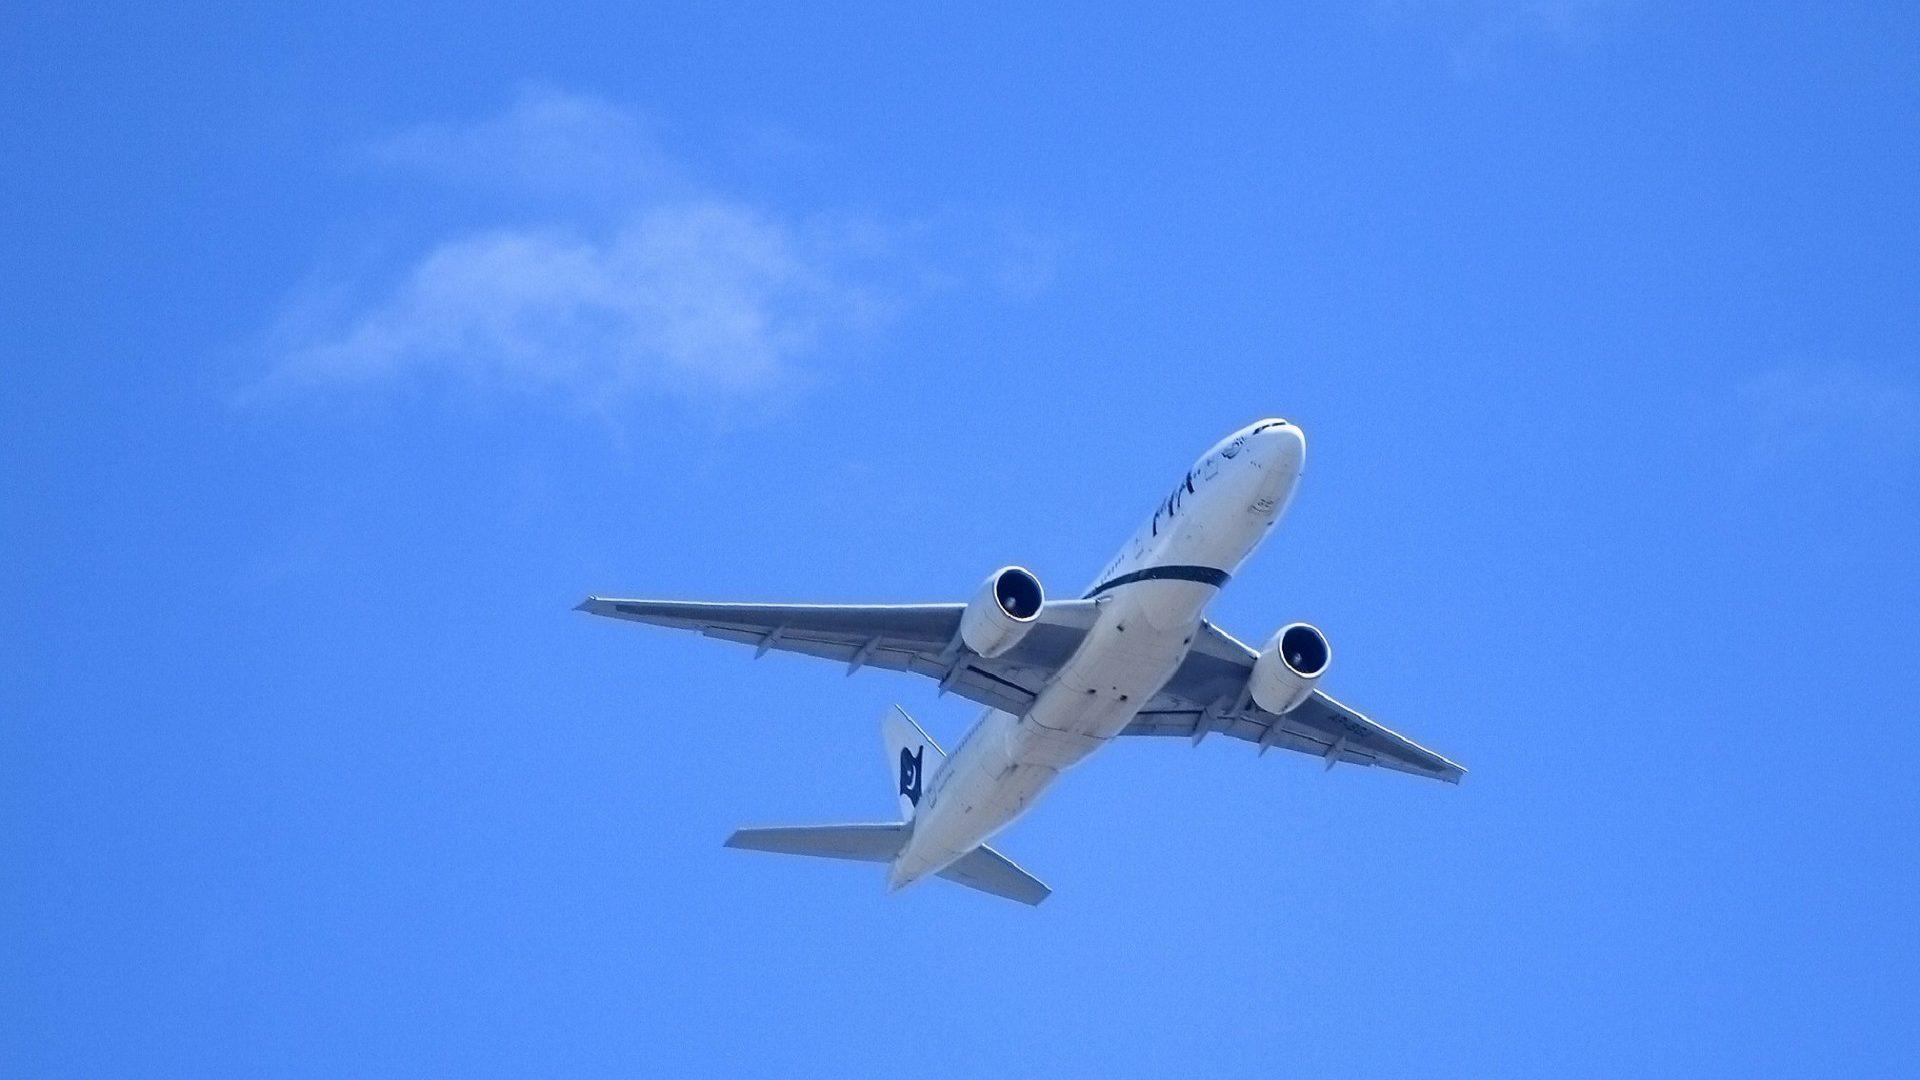 Transporte aéreo internacional